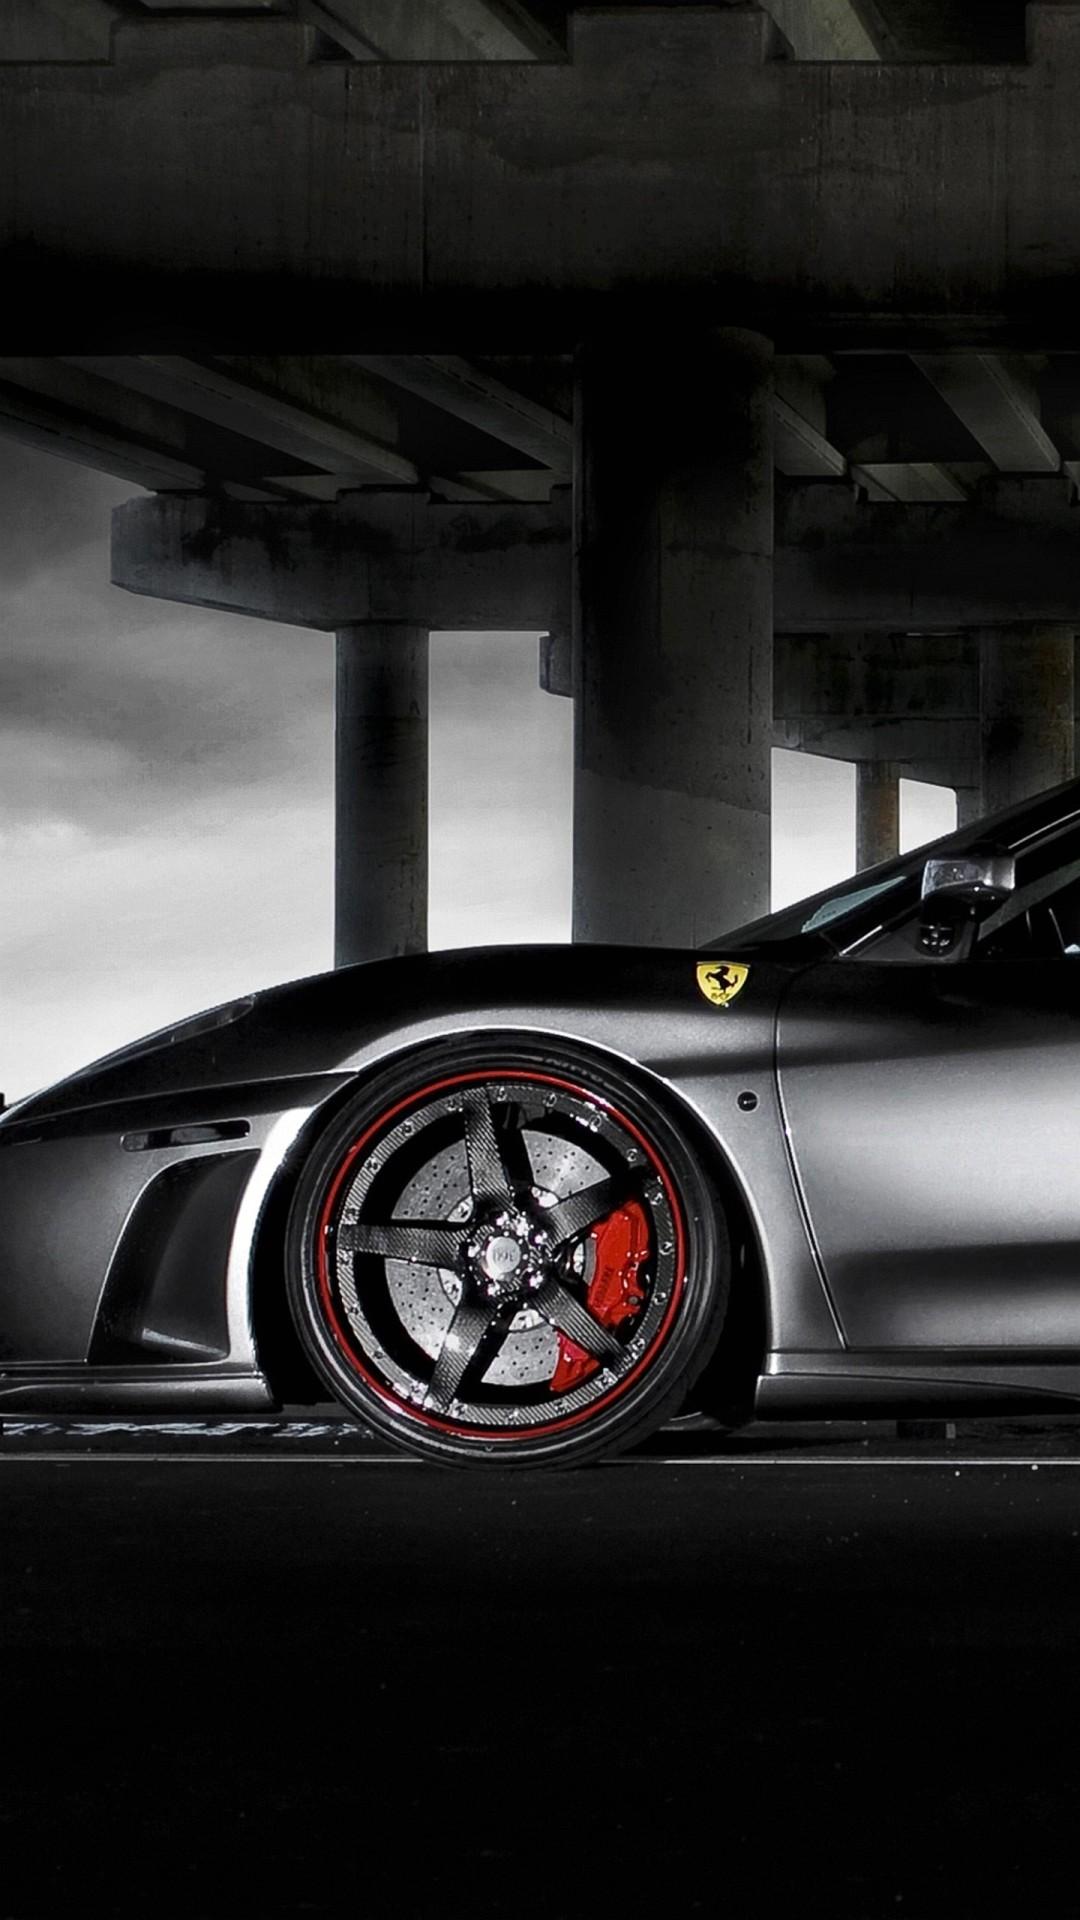 Wallpaper Iphone 6 Plus Ferrari Black 5 5 Inches   1080 x 1920 1080x1920